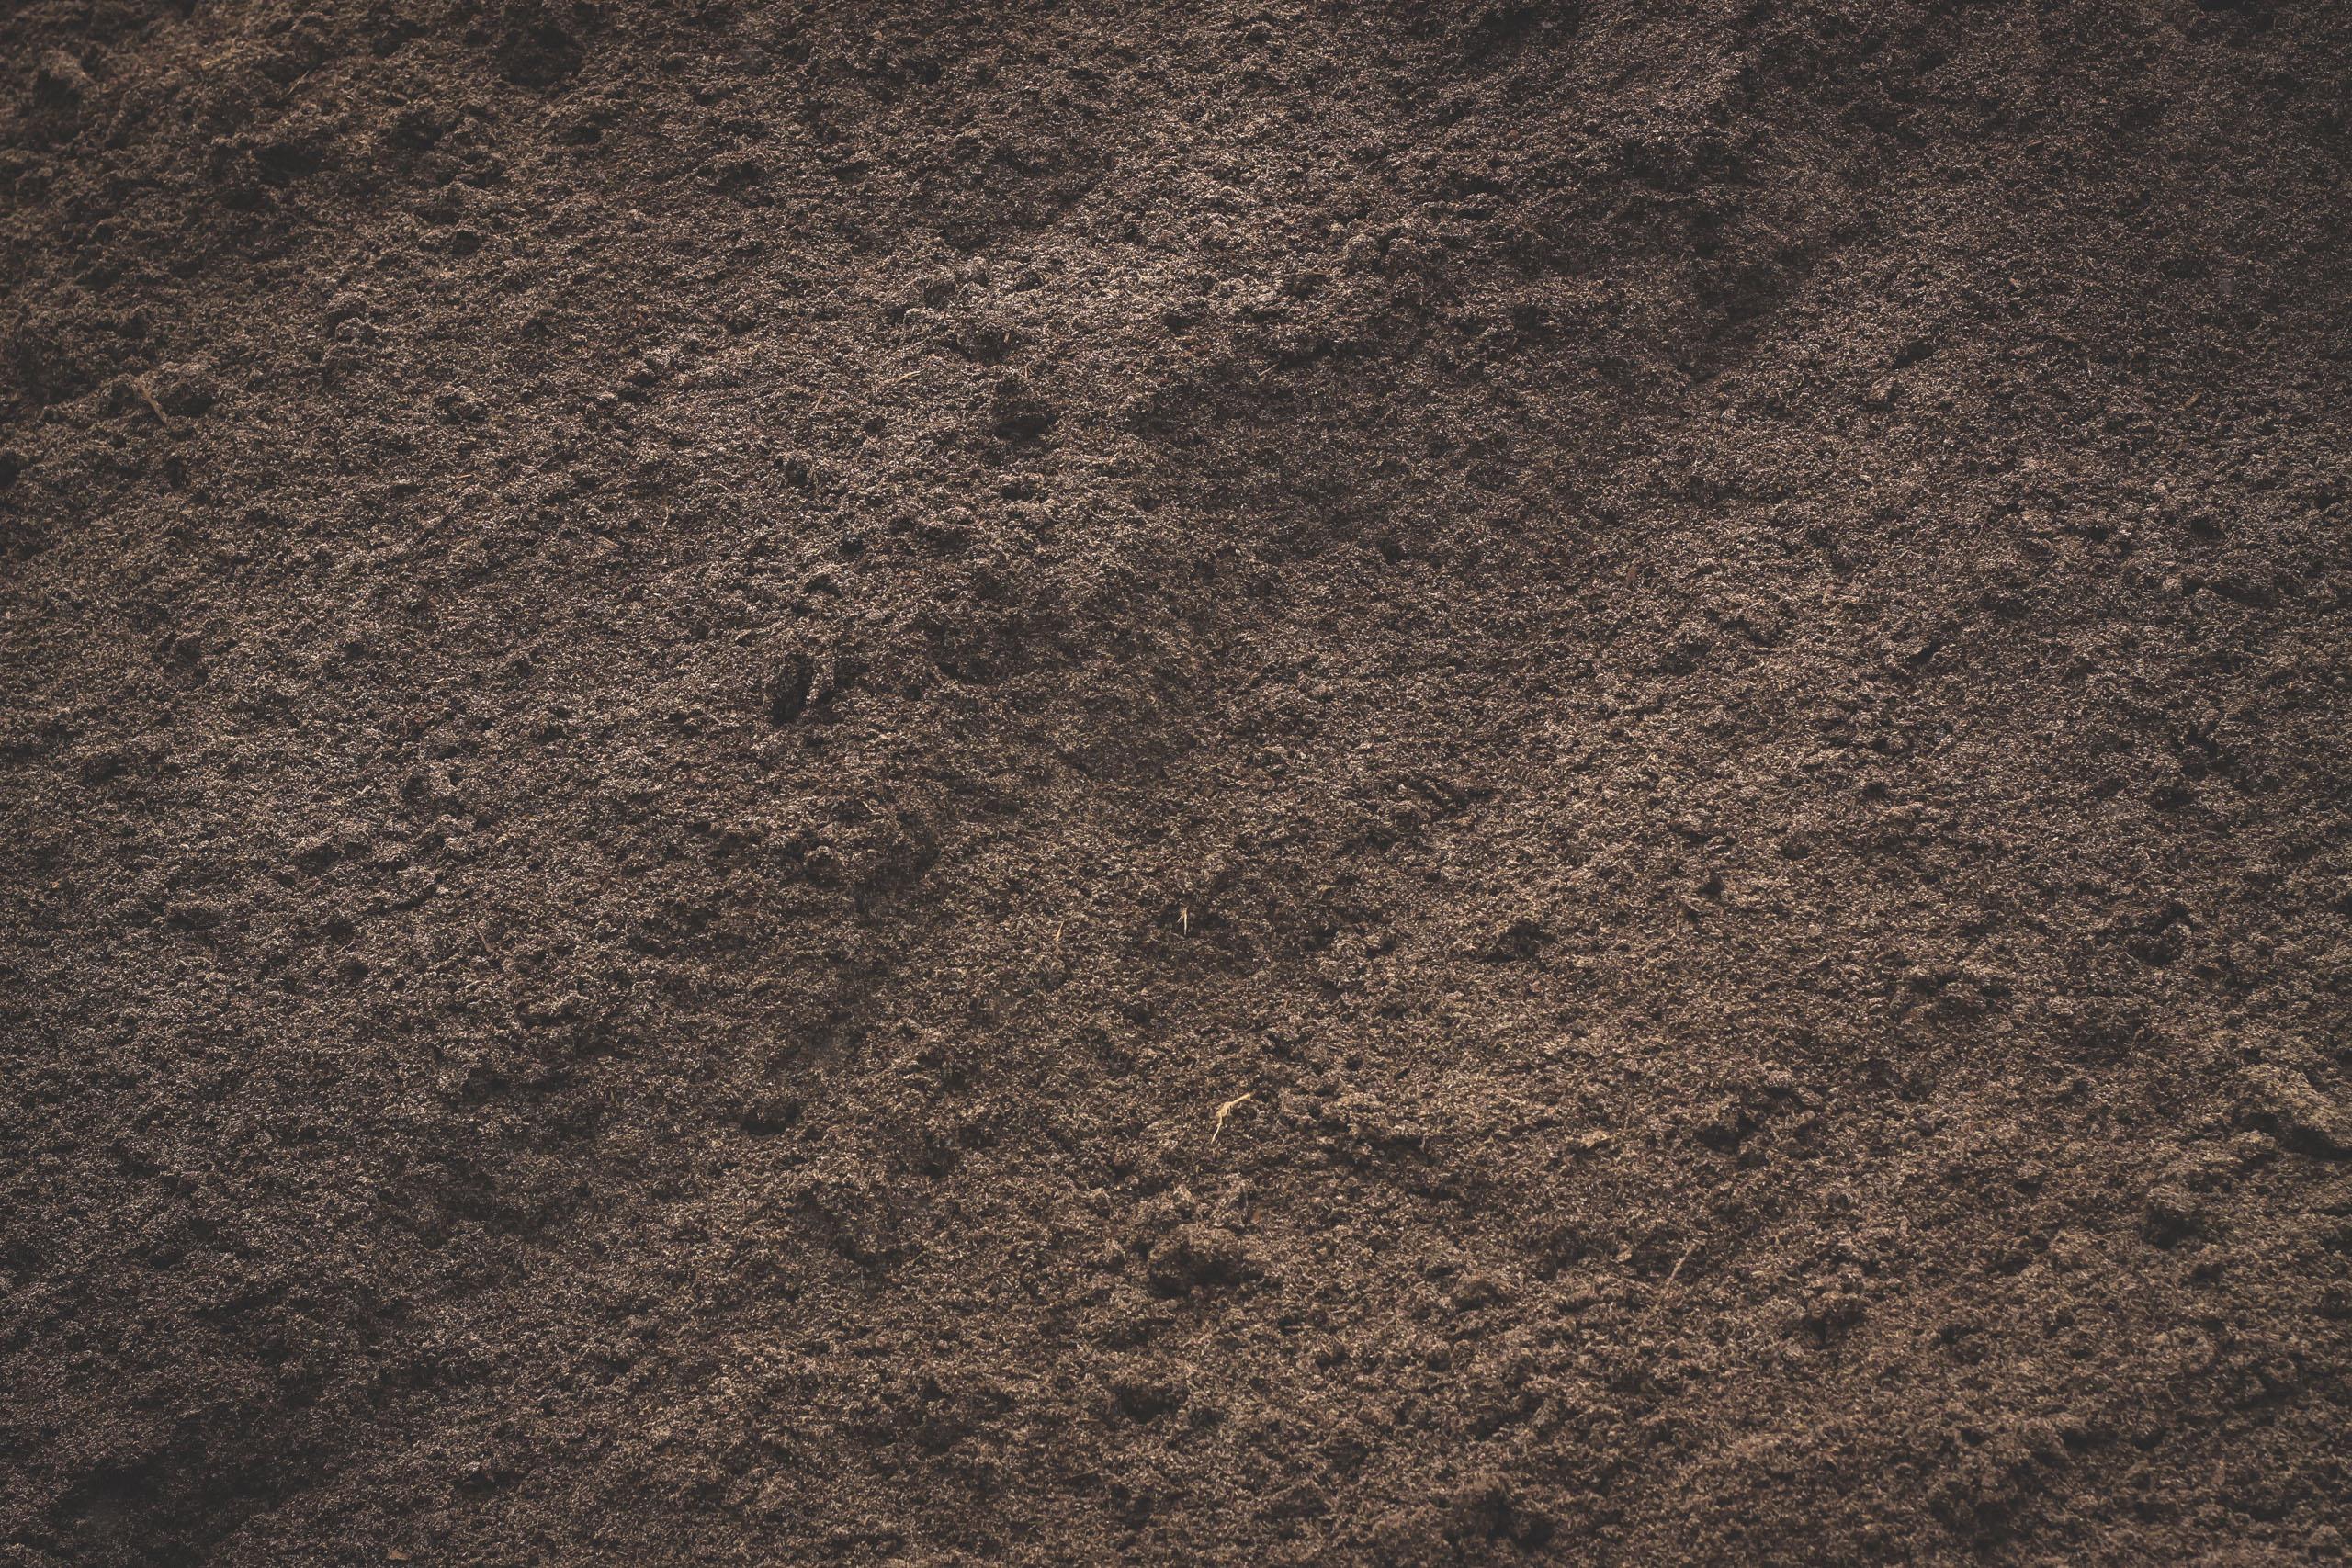 Nitro Mix soil Closeup Landscape Supply Photography